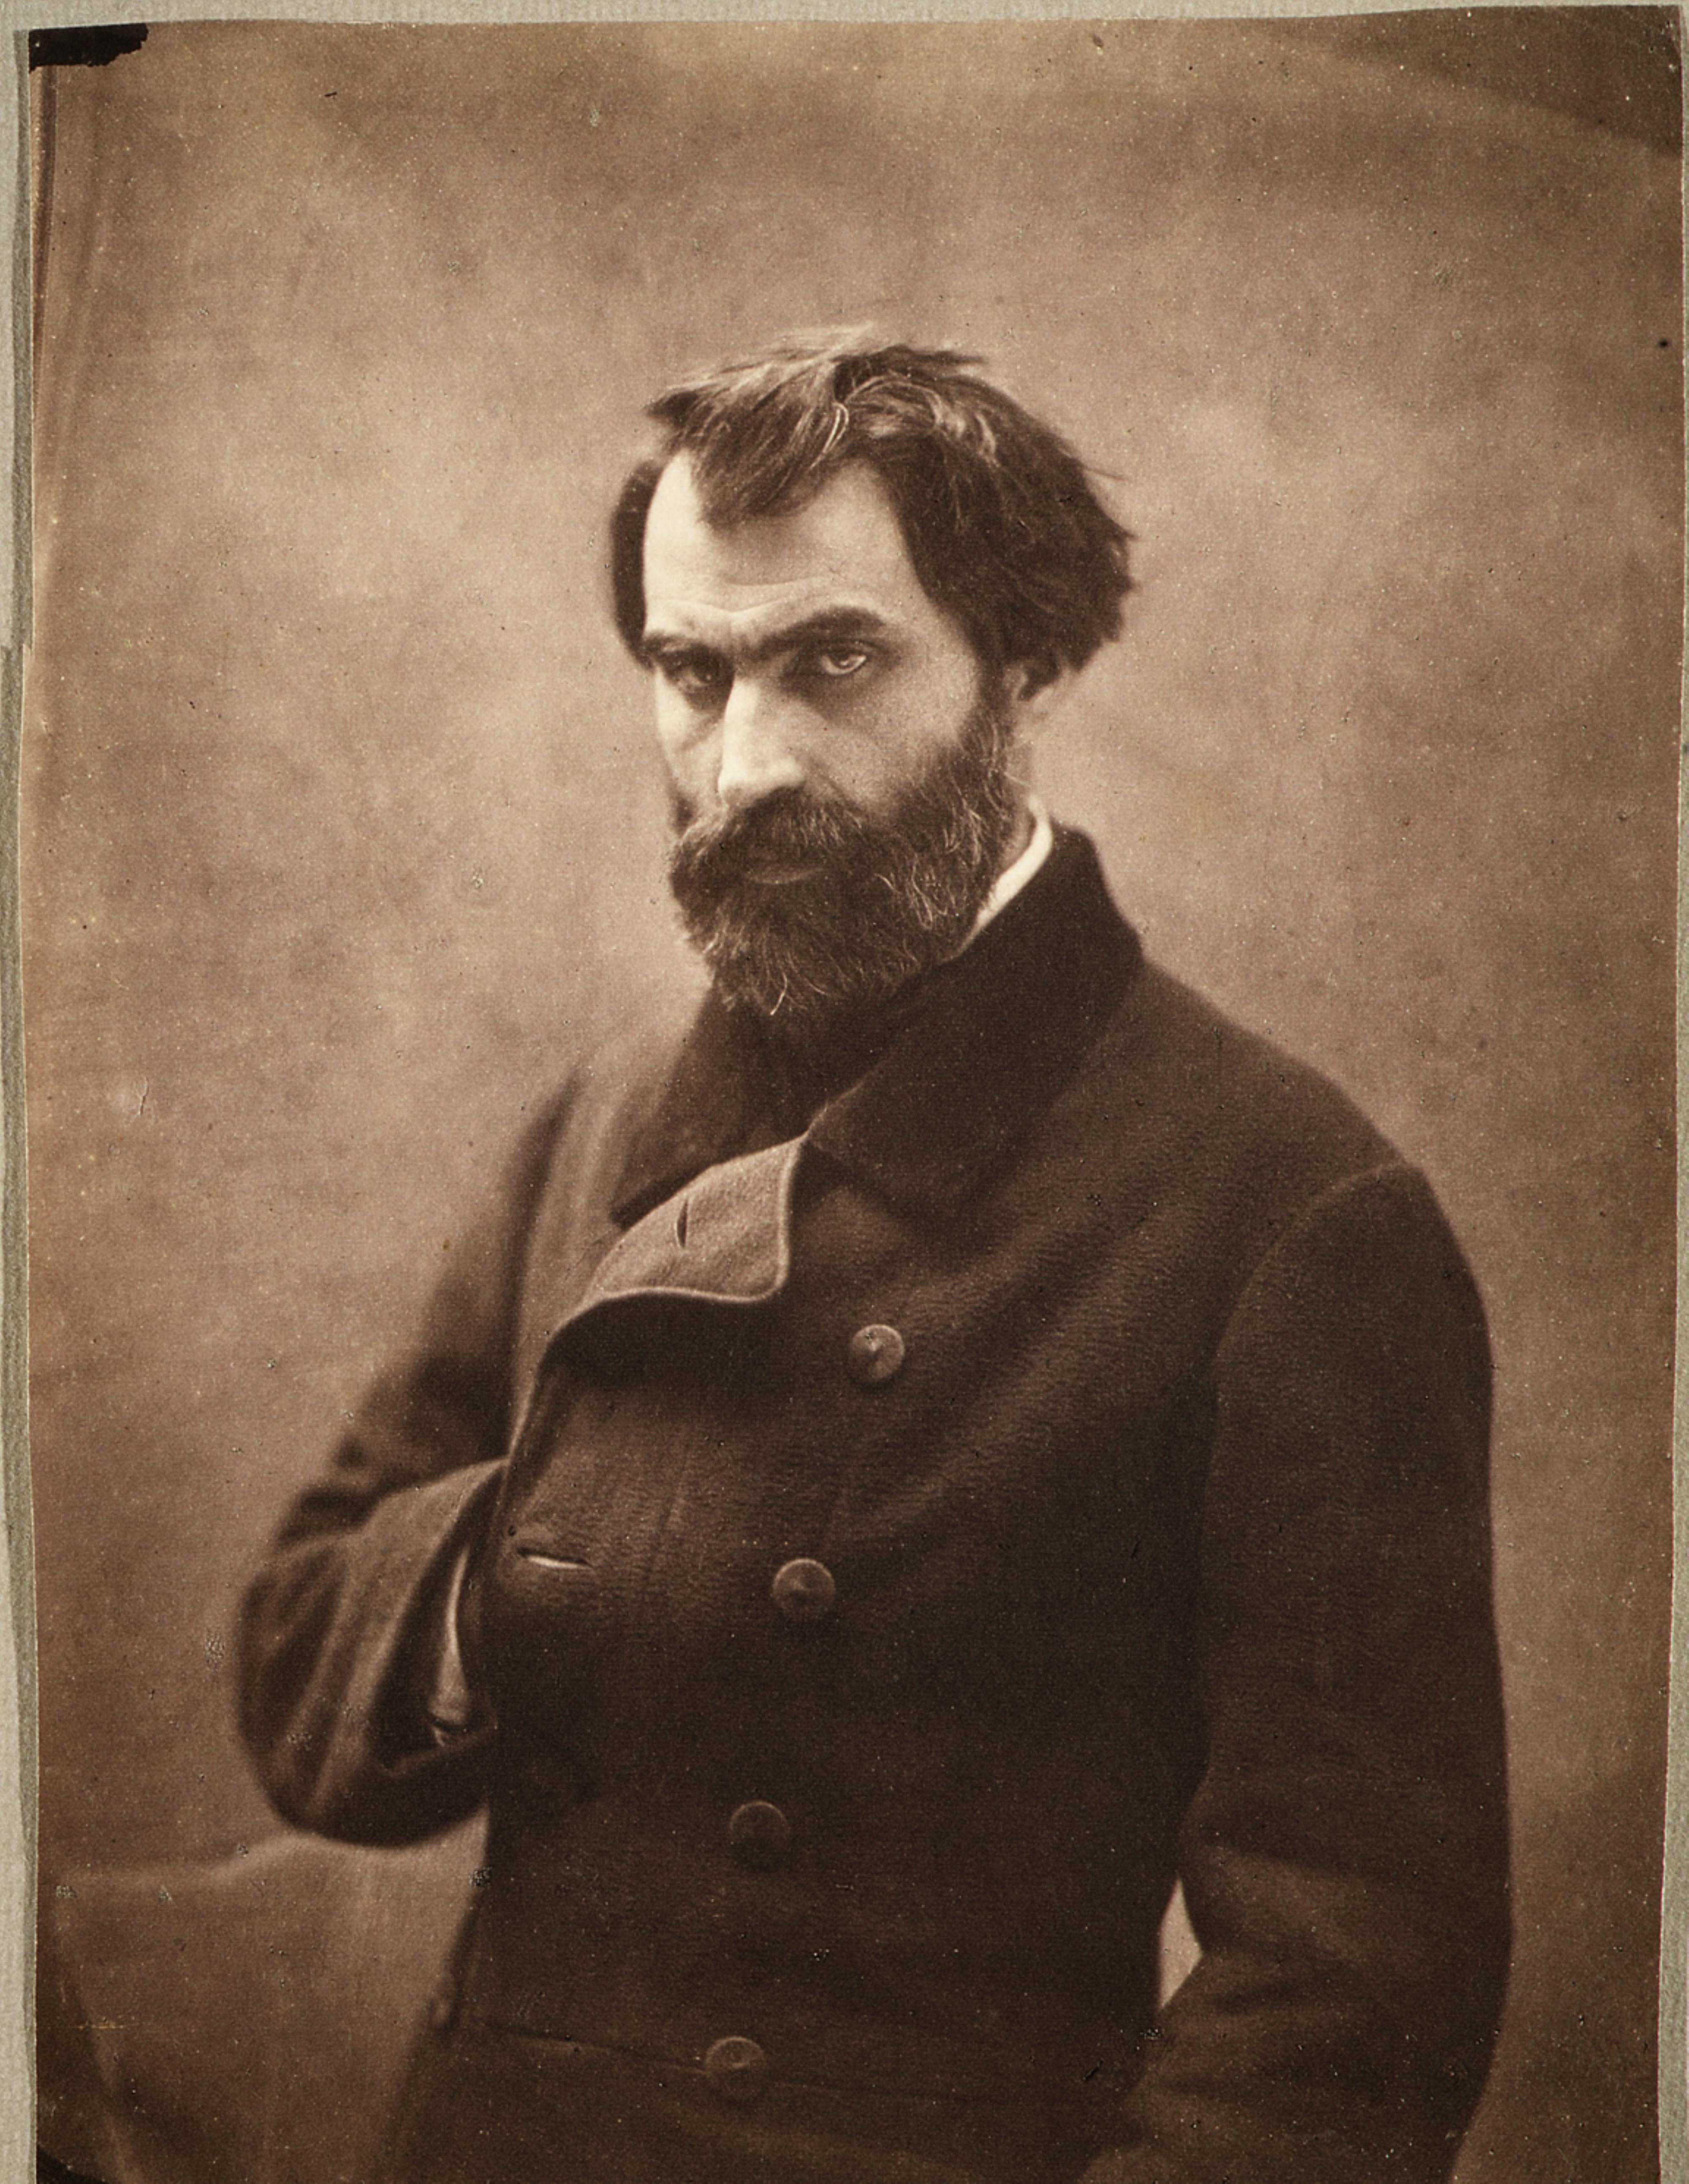 Eugène Pelletan, French writer and journalist